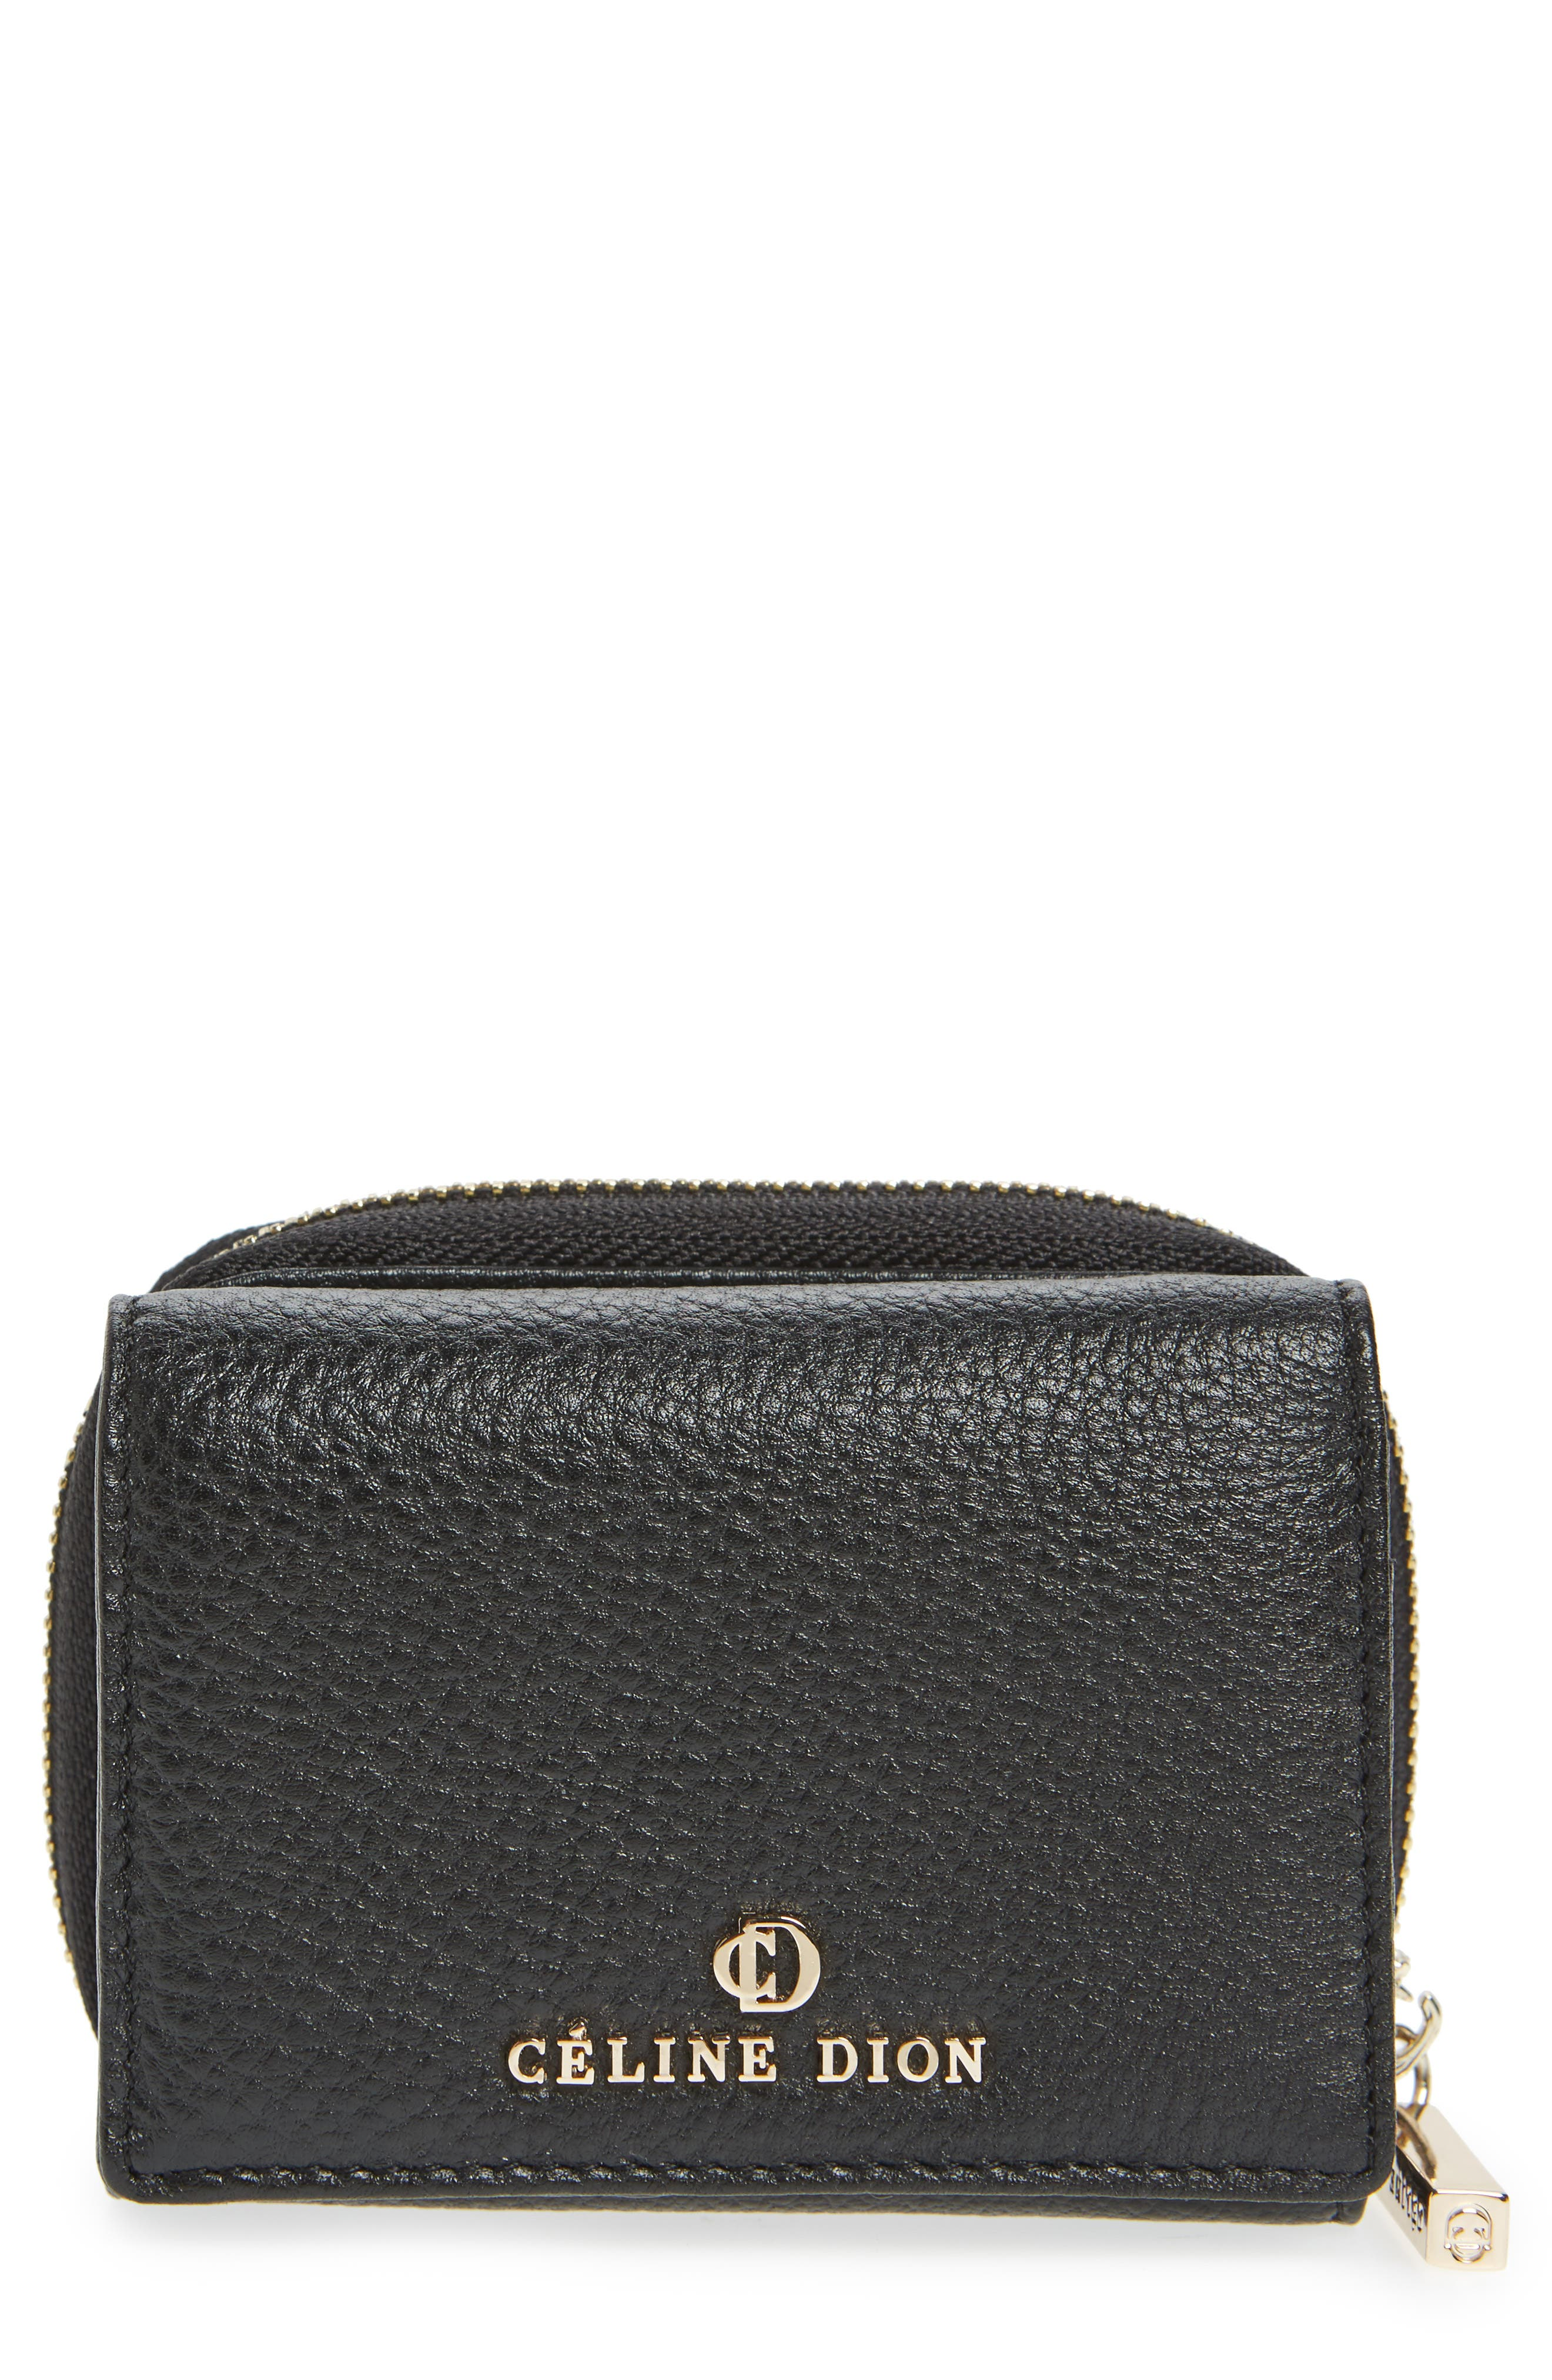 Céline Dion Small Adagio Leather Wallet